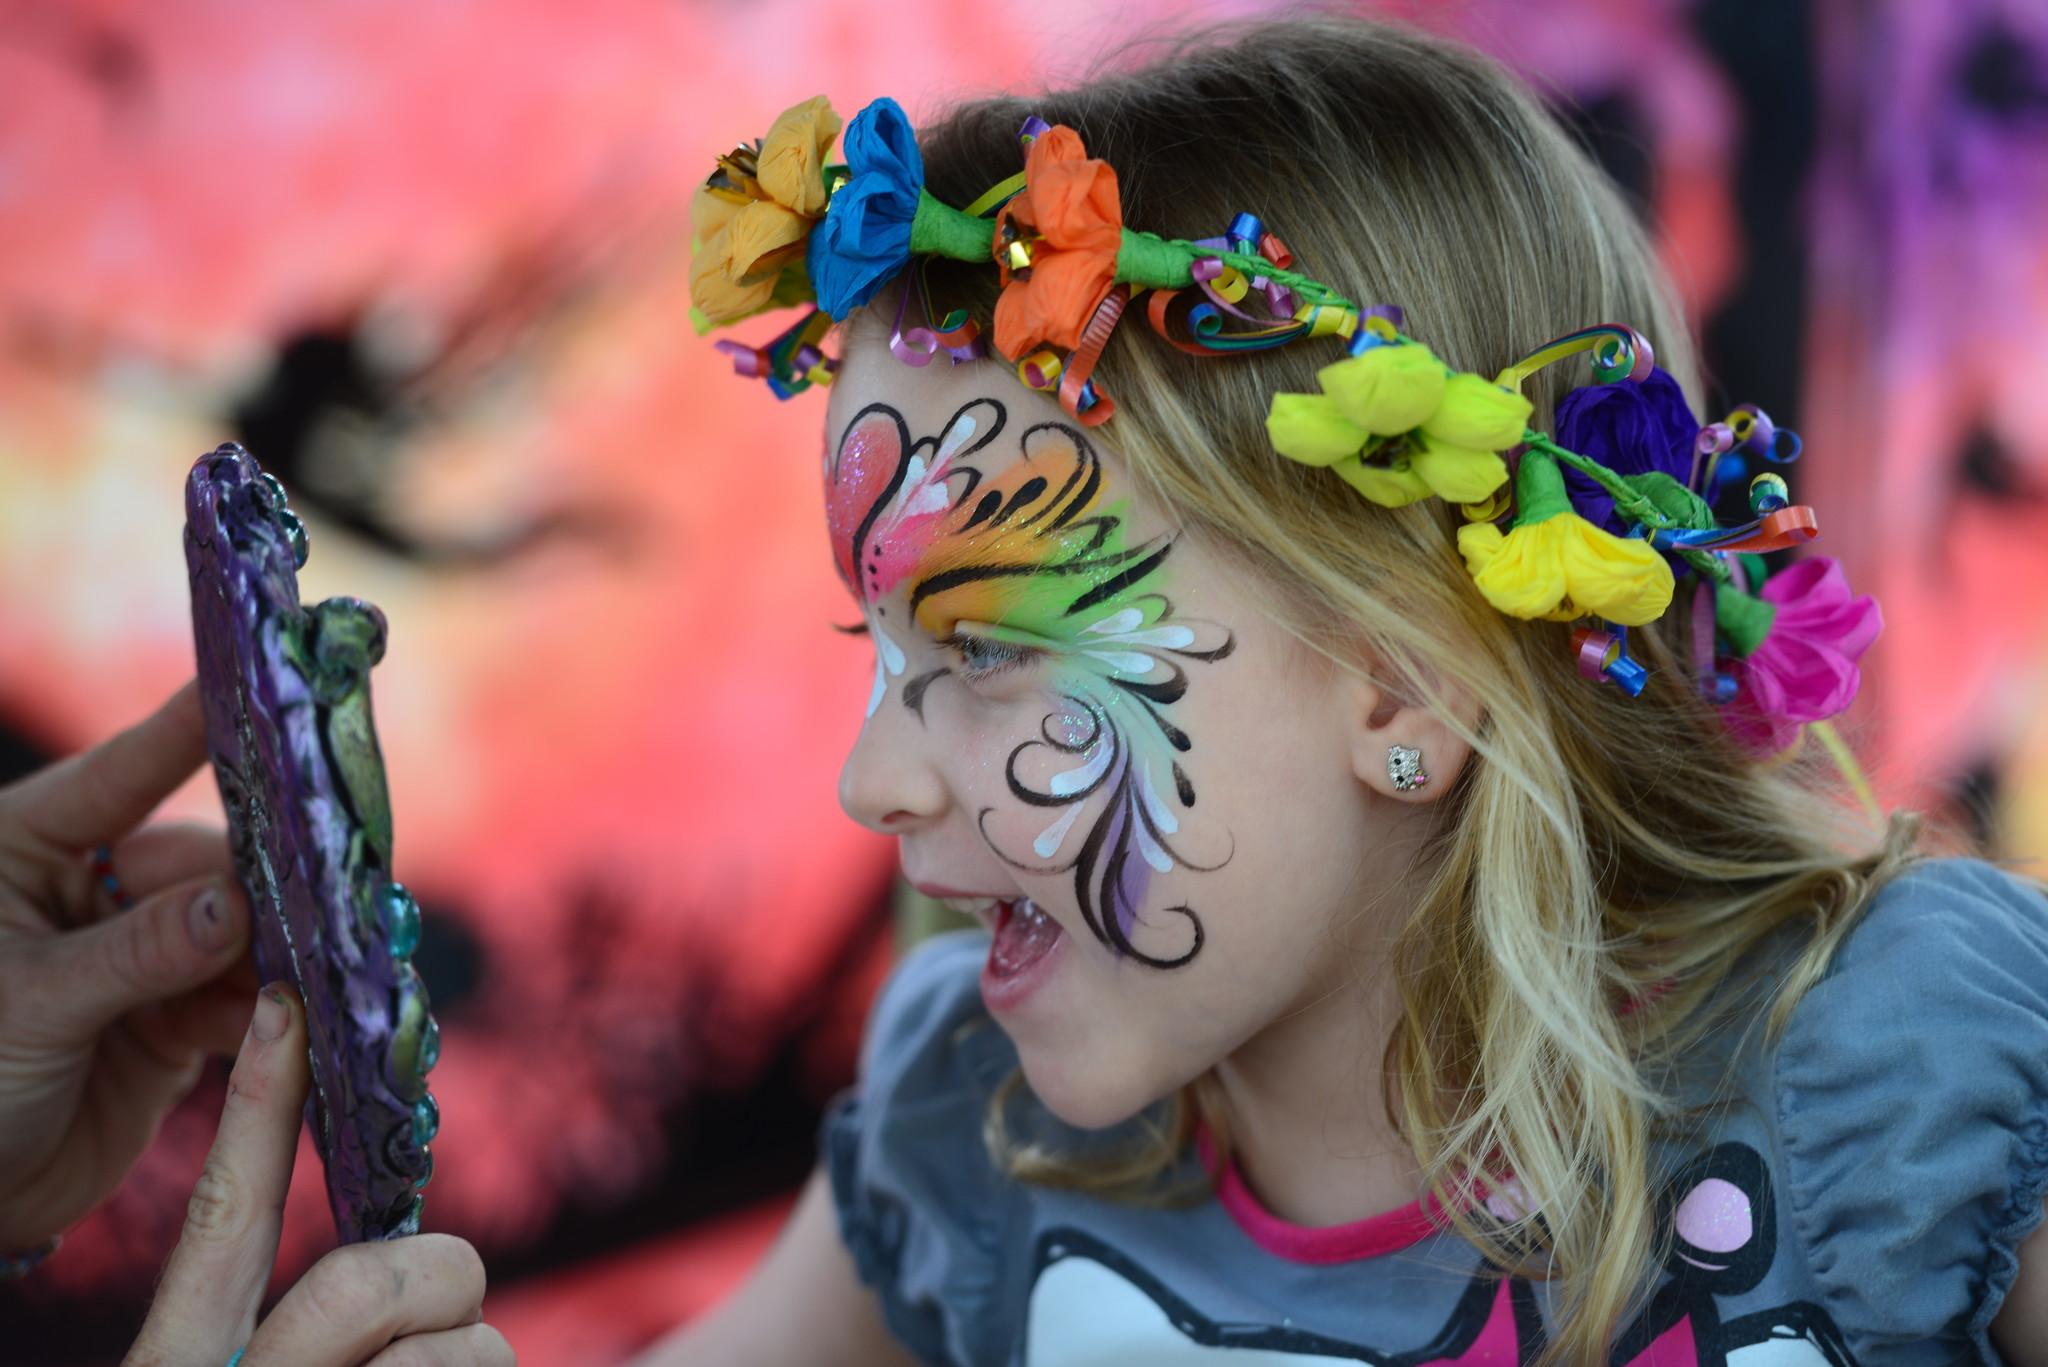 Renaissance Festival photos - Alexandra Hickey